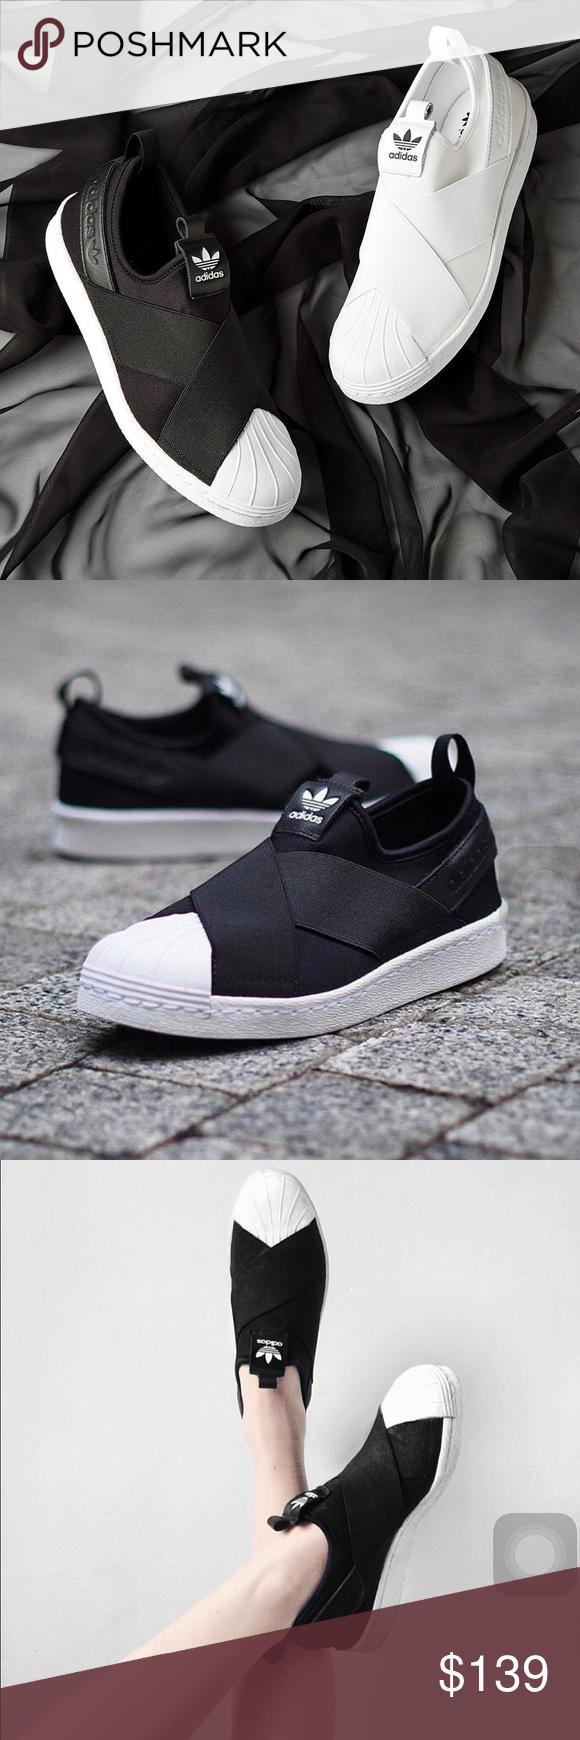 Adidas Wmns Superstar Slip On Core Black Footwear White